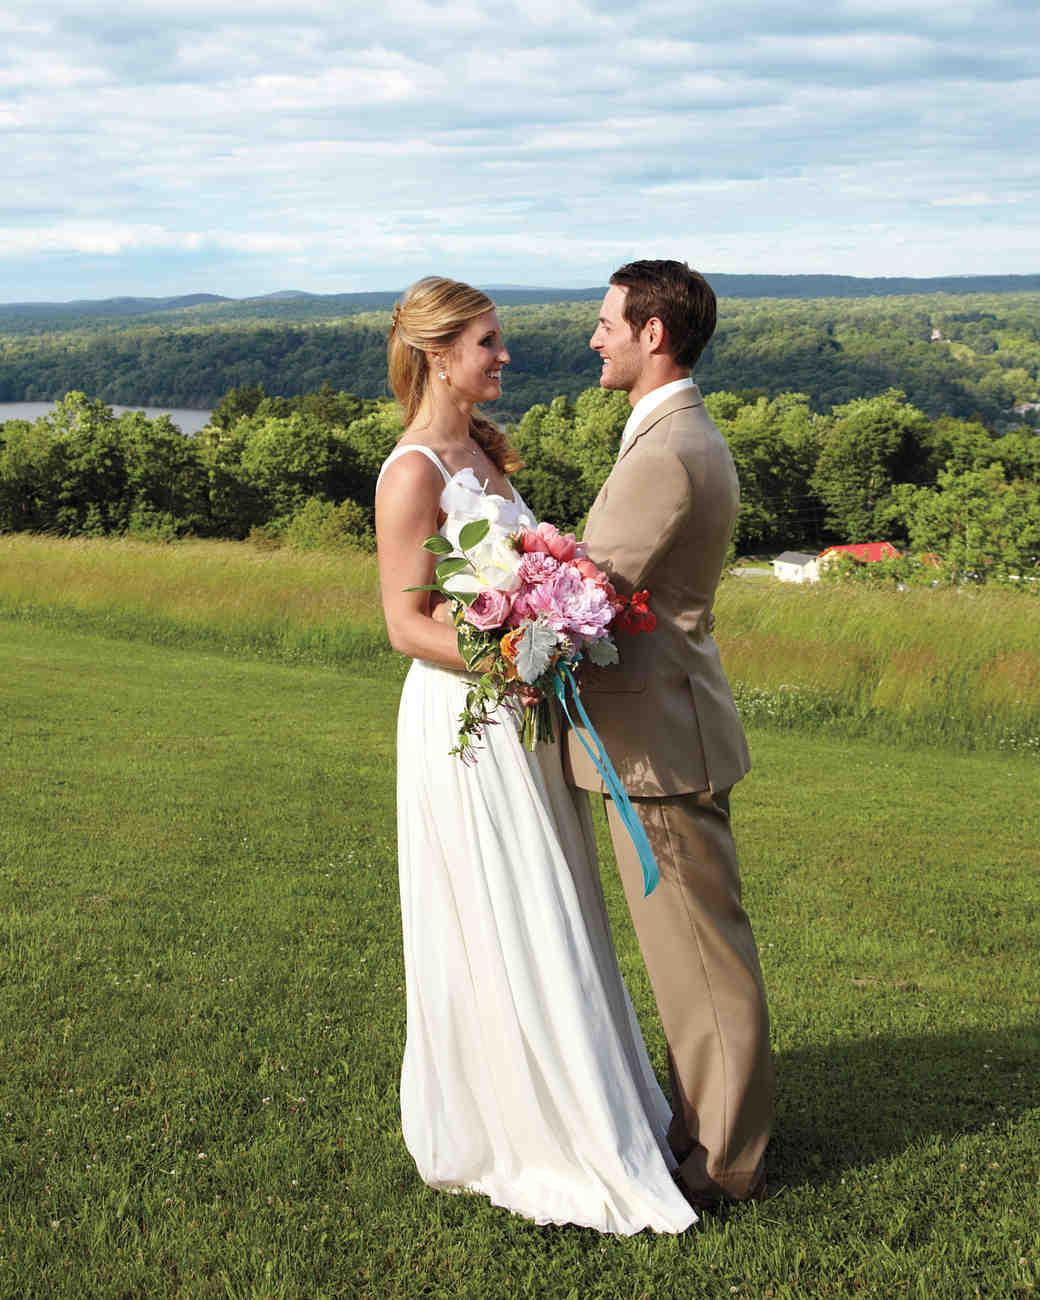 leanna-matt-wedding-2220-s111371.jpg